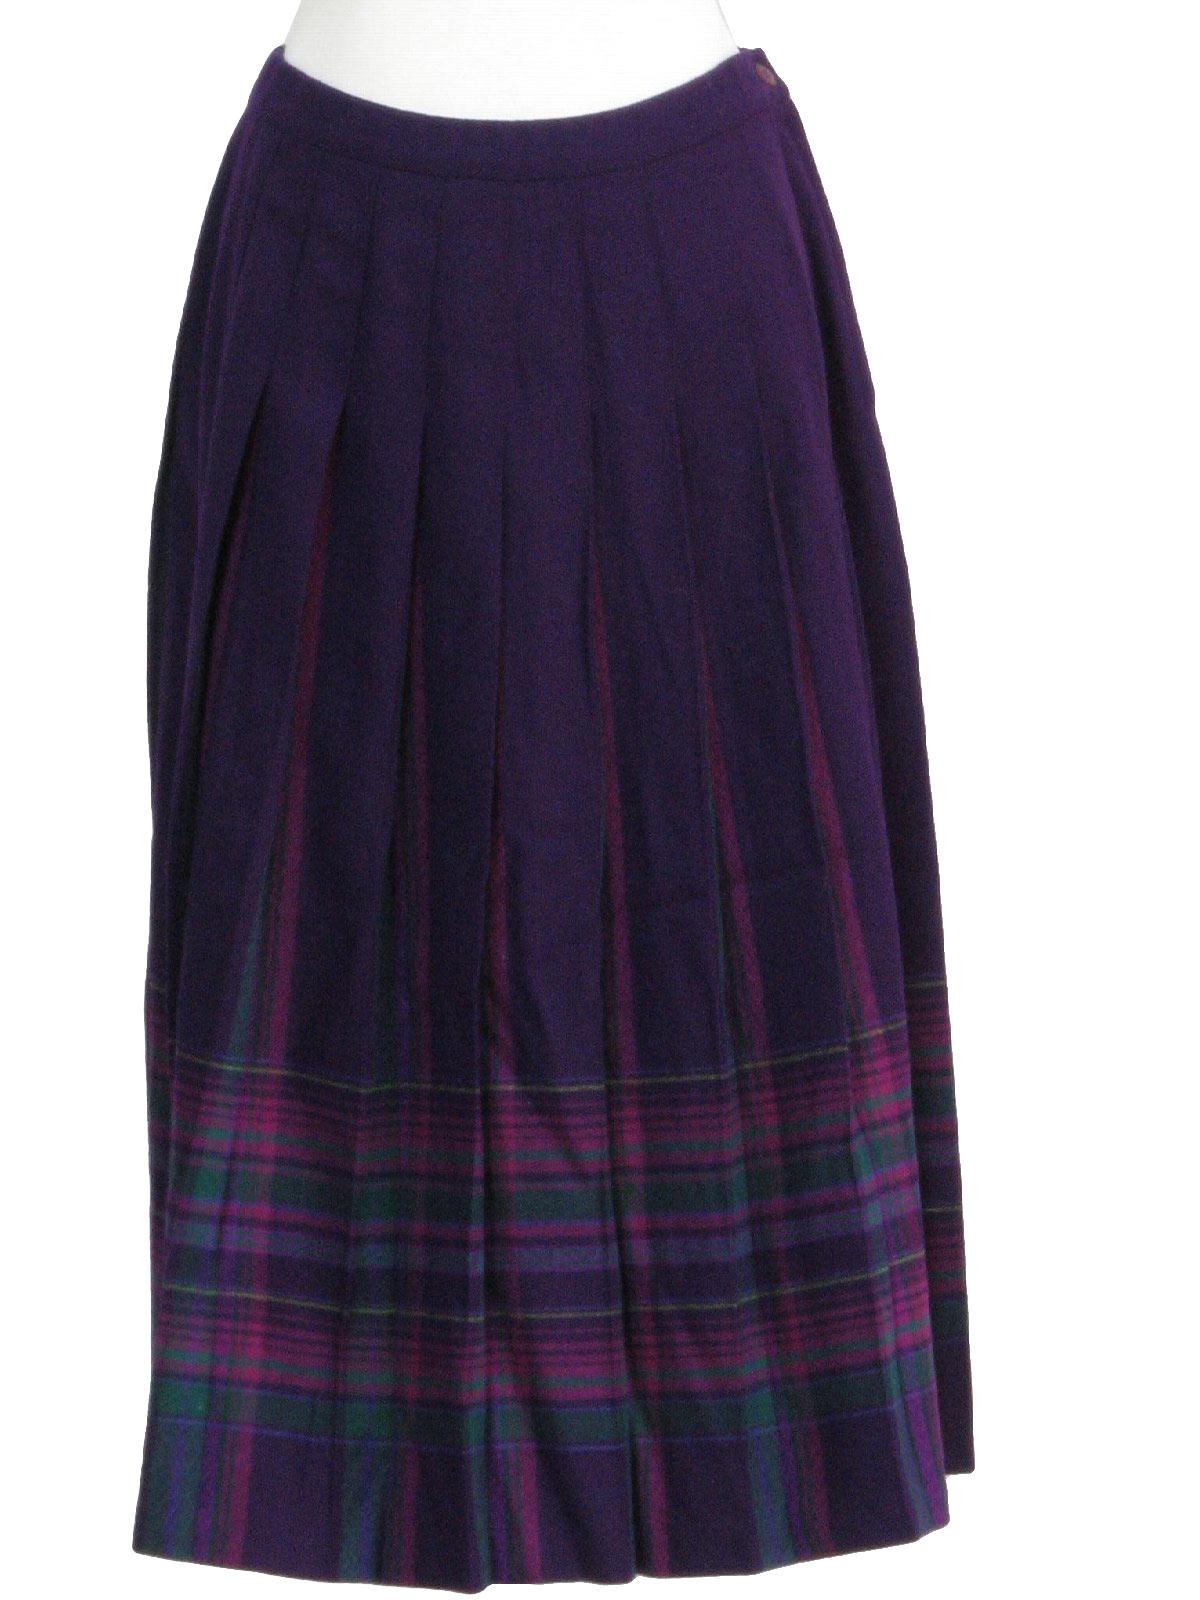 3f892938a6 Pendleton Seventies Vintage Plaid Skirt: 70s -Pendleton- Womens ...